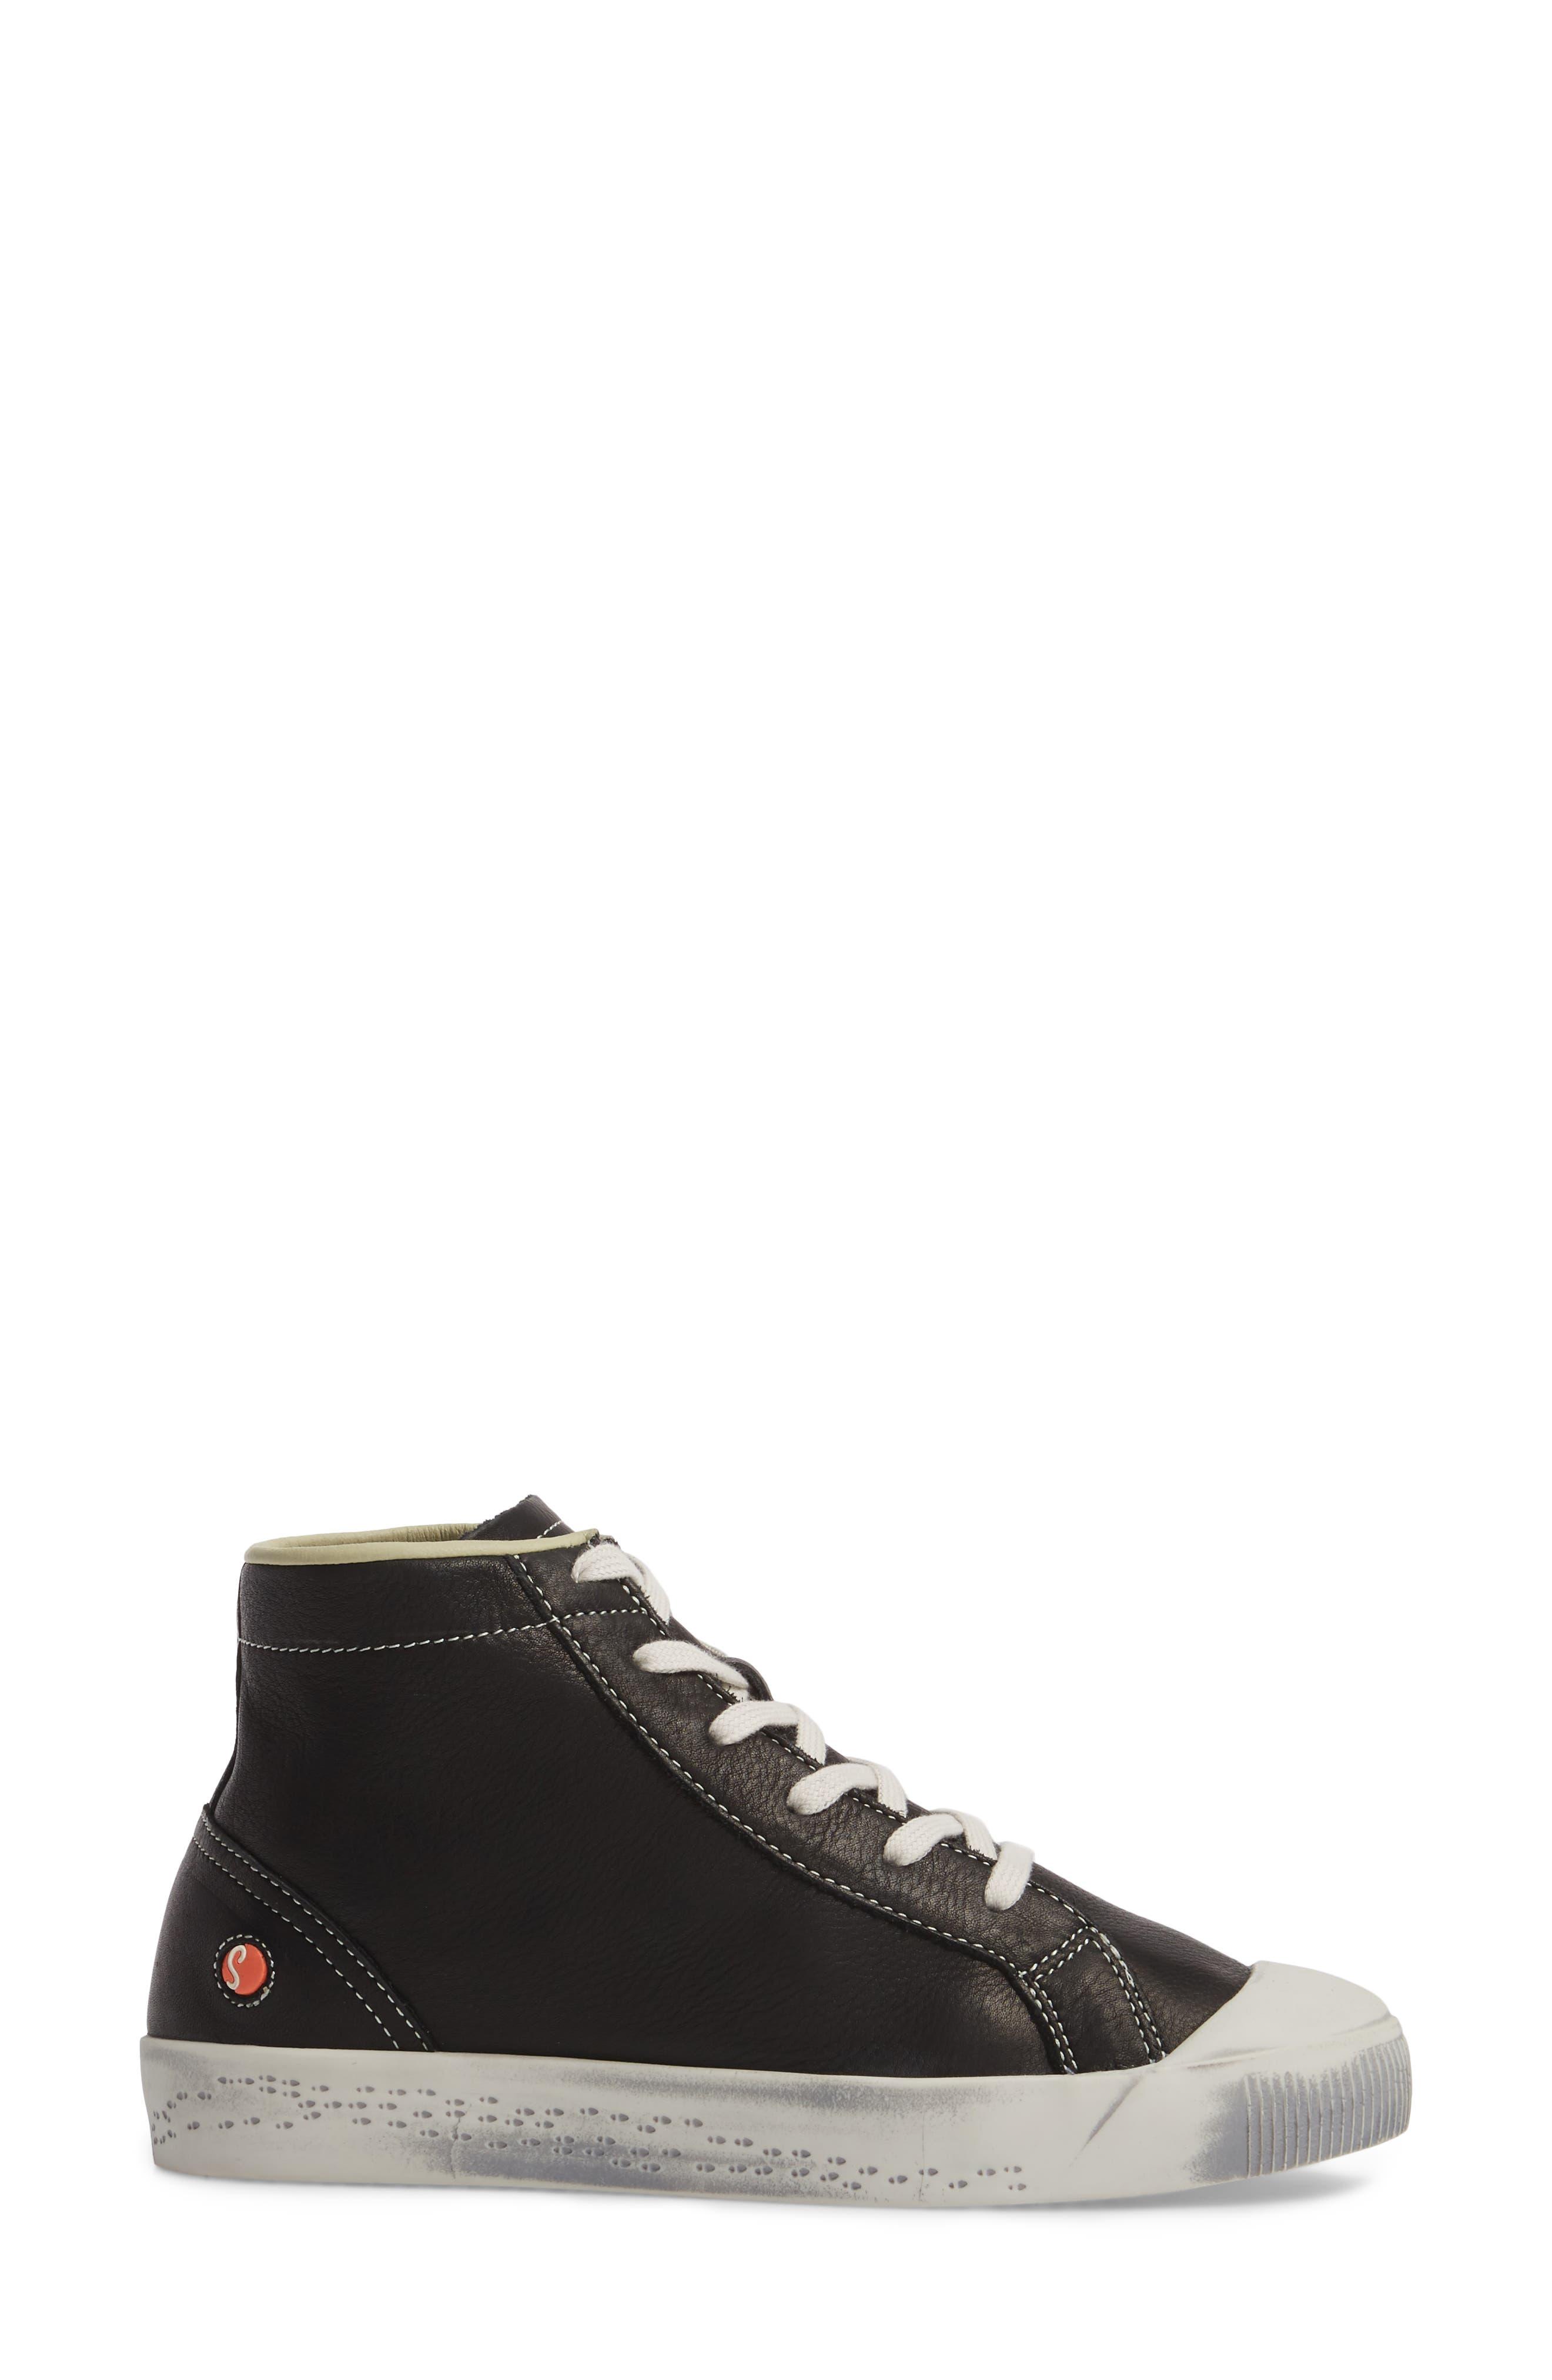 Kip High Top Sneaker,                             Alternate thumbnail 3, color,                             001